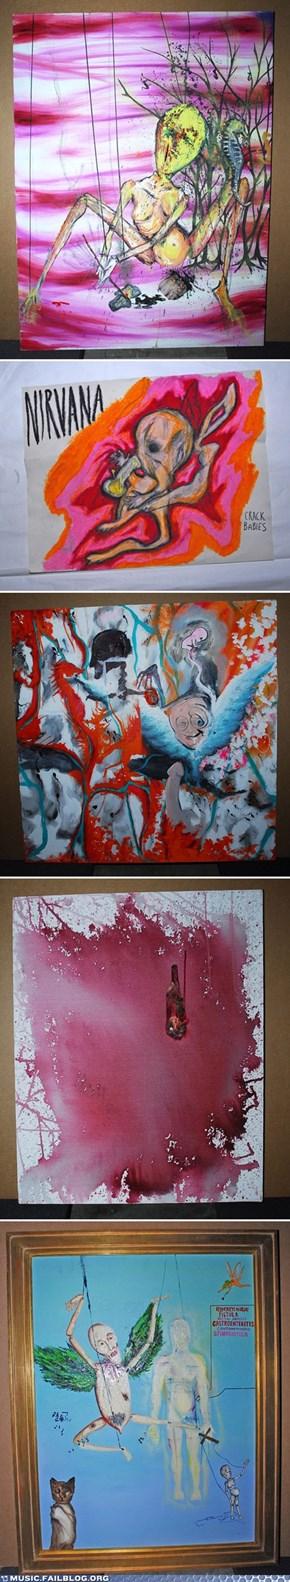 Five Art Pieces by Kurt Cobain Unveiled